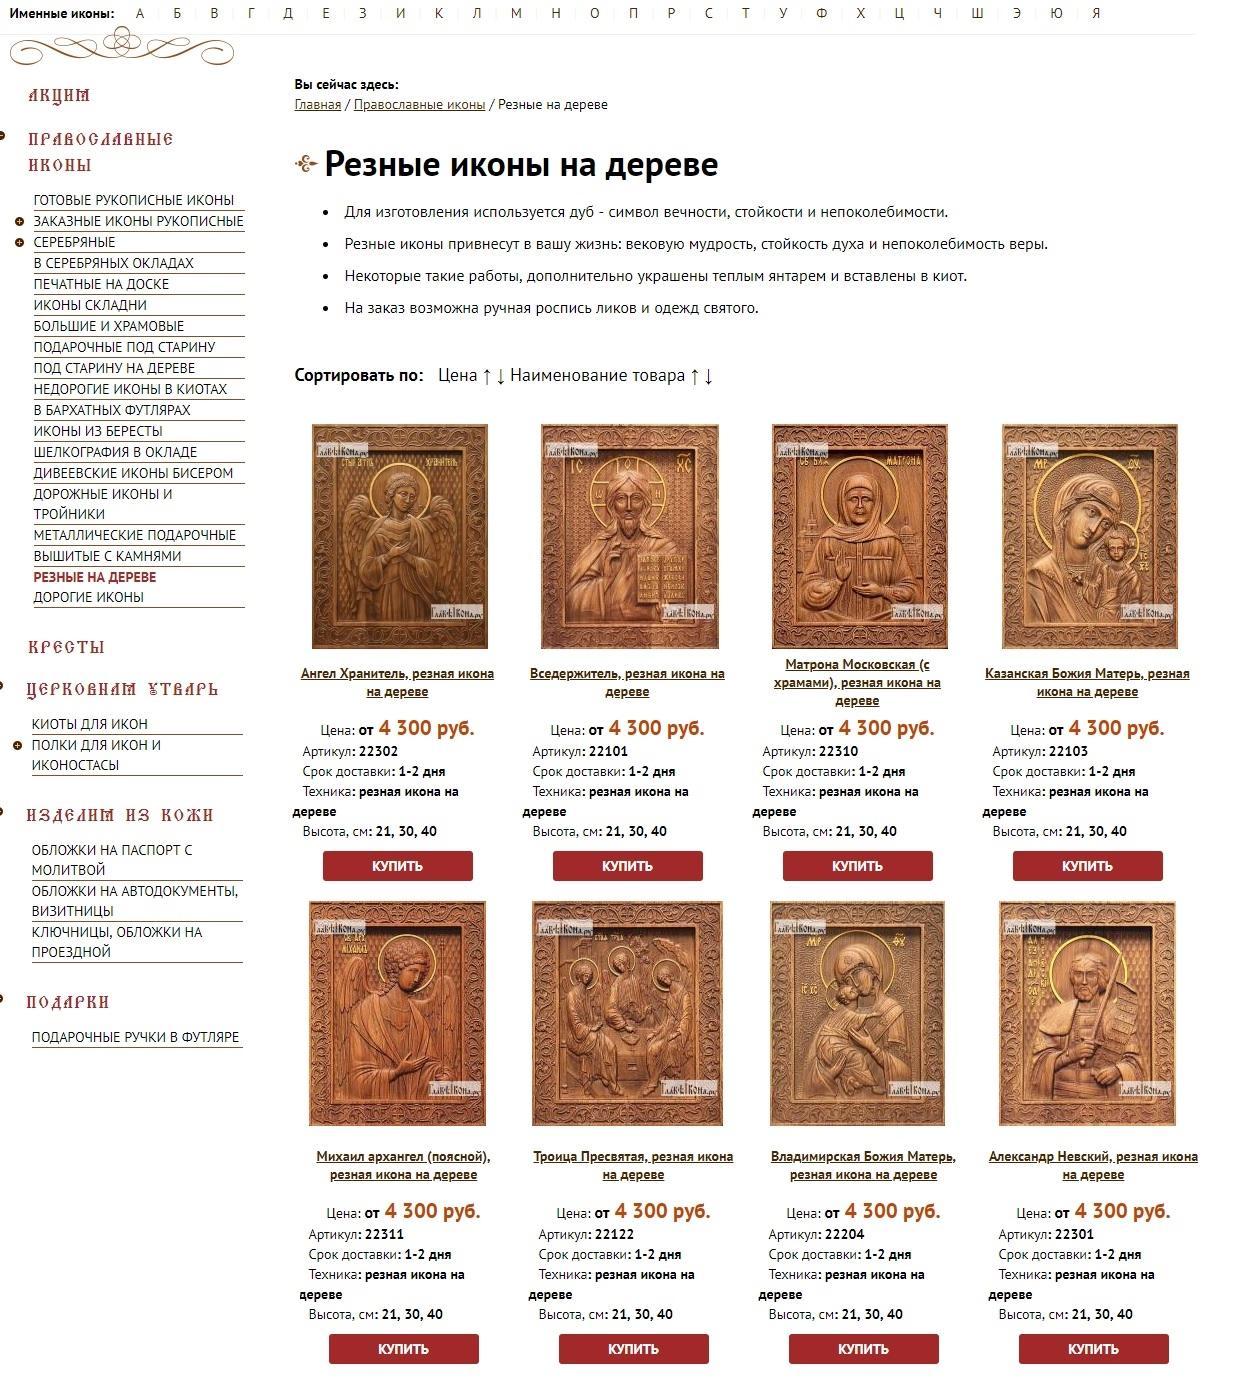 Текст на странице каталога интернет-магазина